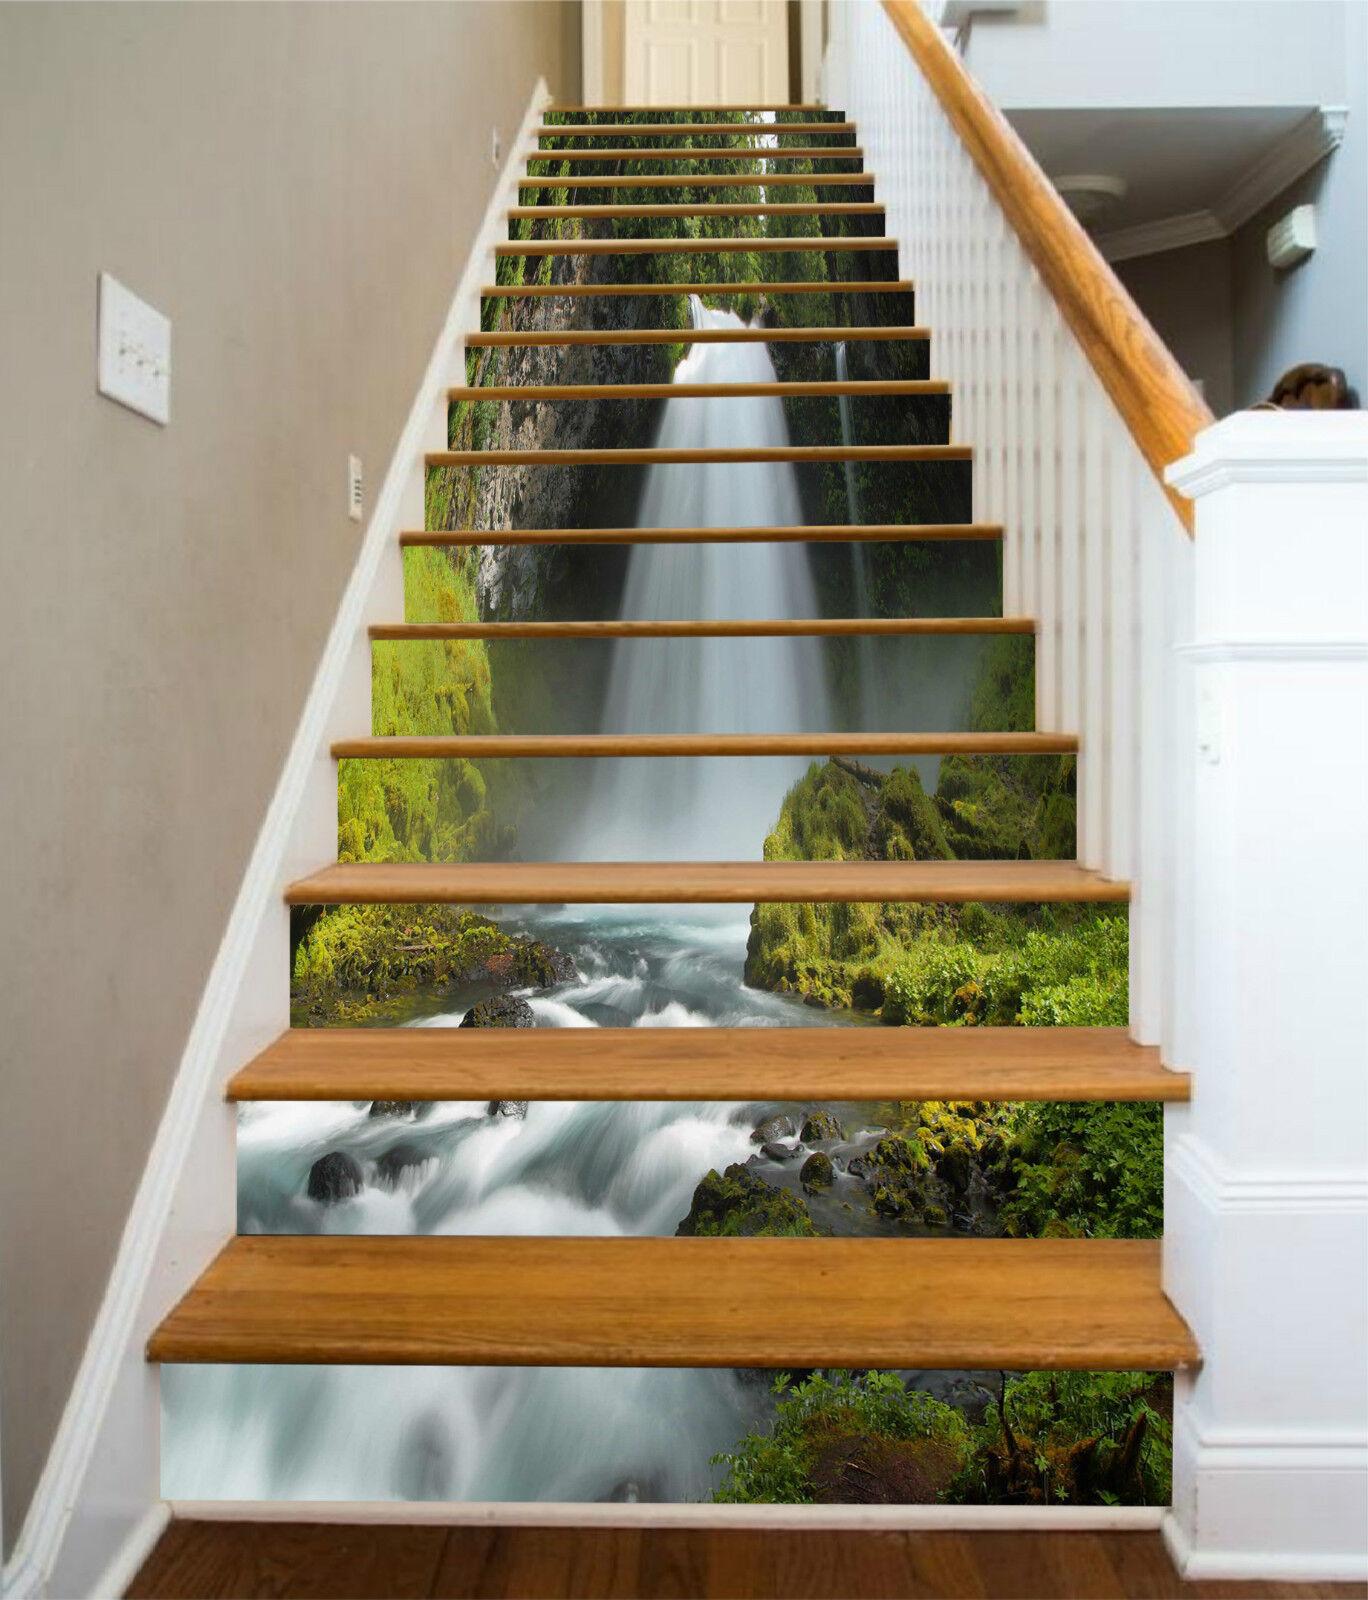 3D Wasserfall 896 Stair Risers Dekoration Fototapete Vinyl Aufkleber Tapete DE